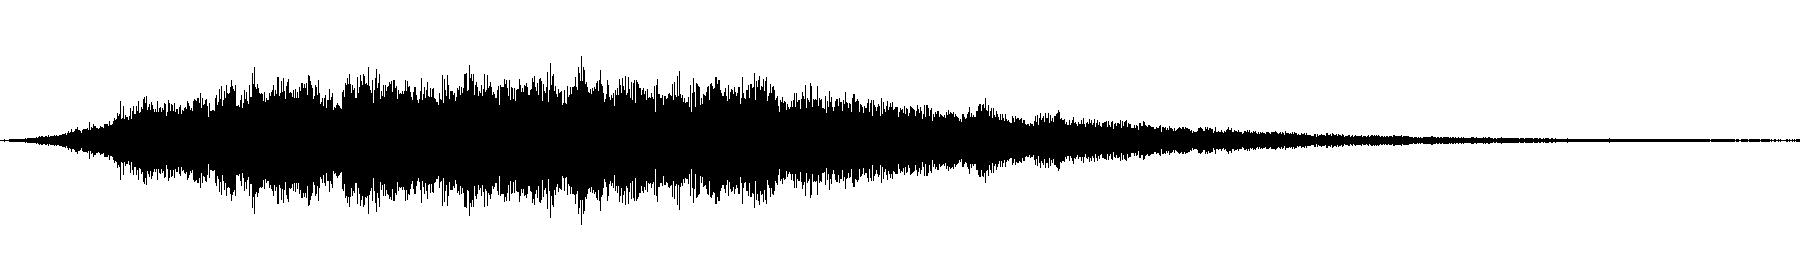 synth choir a7